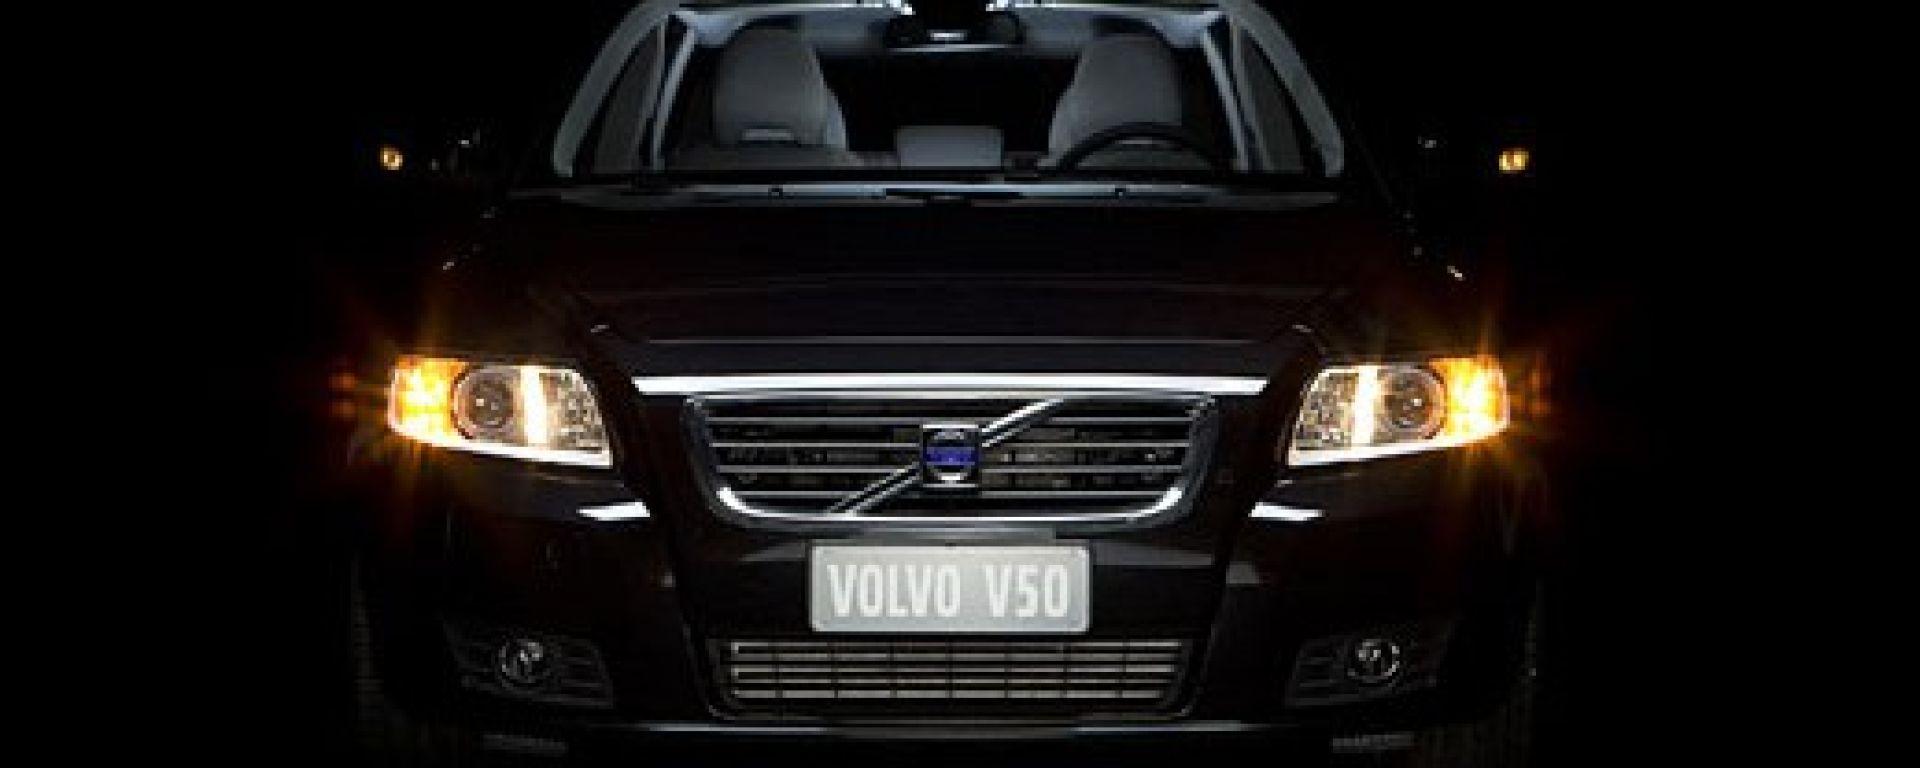 Volvo V50 Trifuel